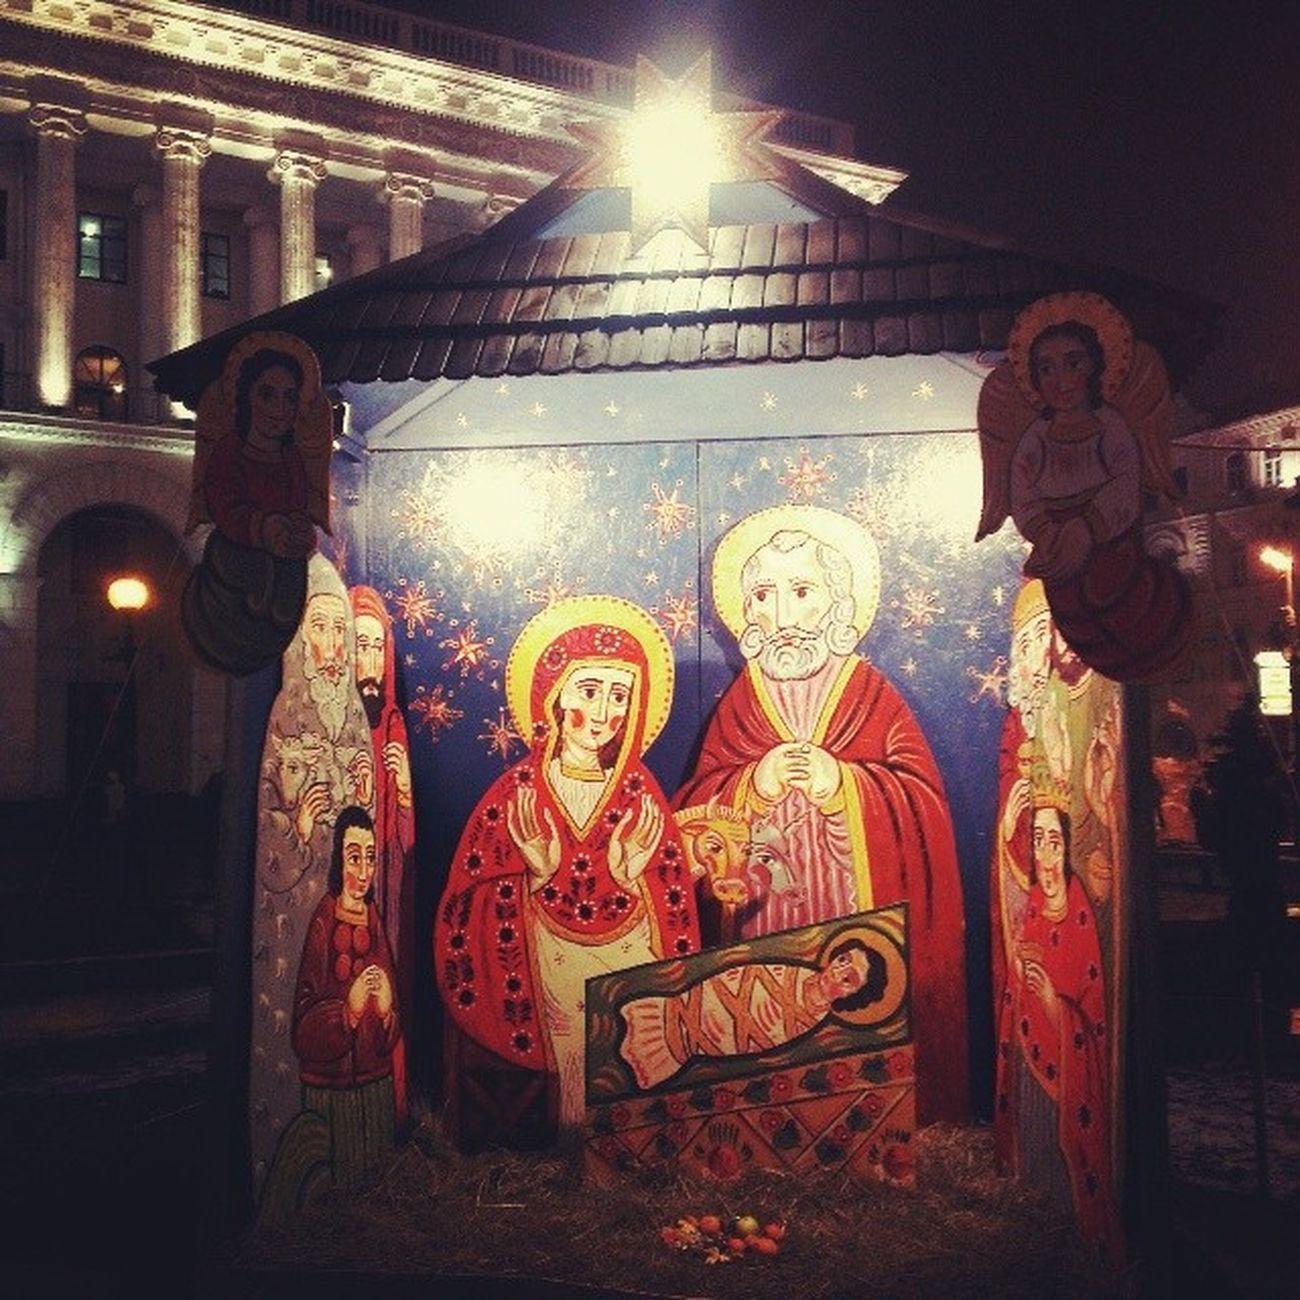 Миколай! евромайдан євромайдан Euromaidan Kievblog Kyiv Kiev UA Ukraine Миколай украина Киев